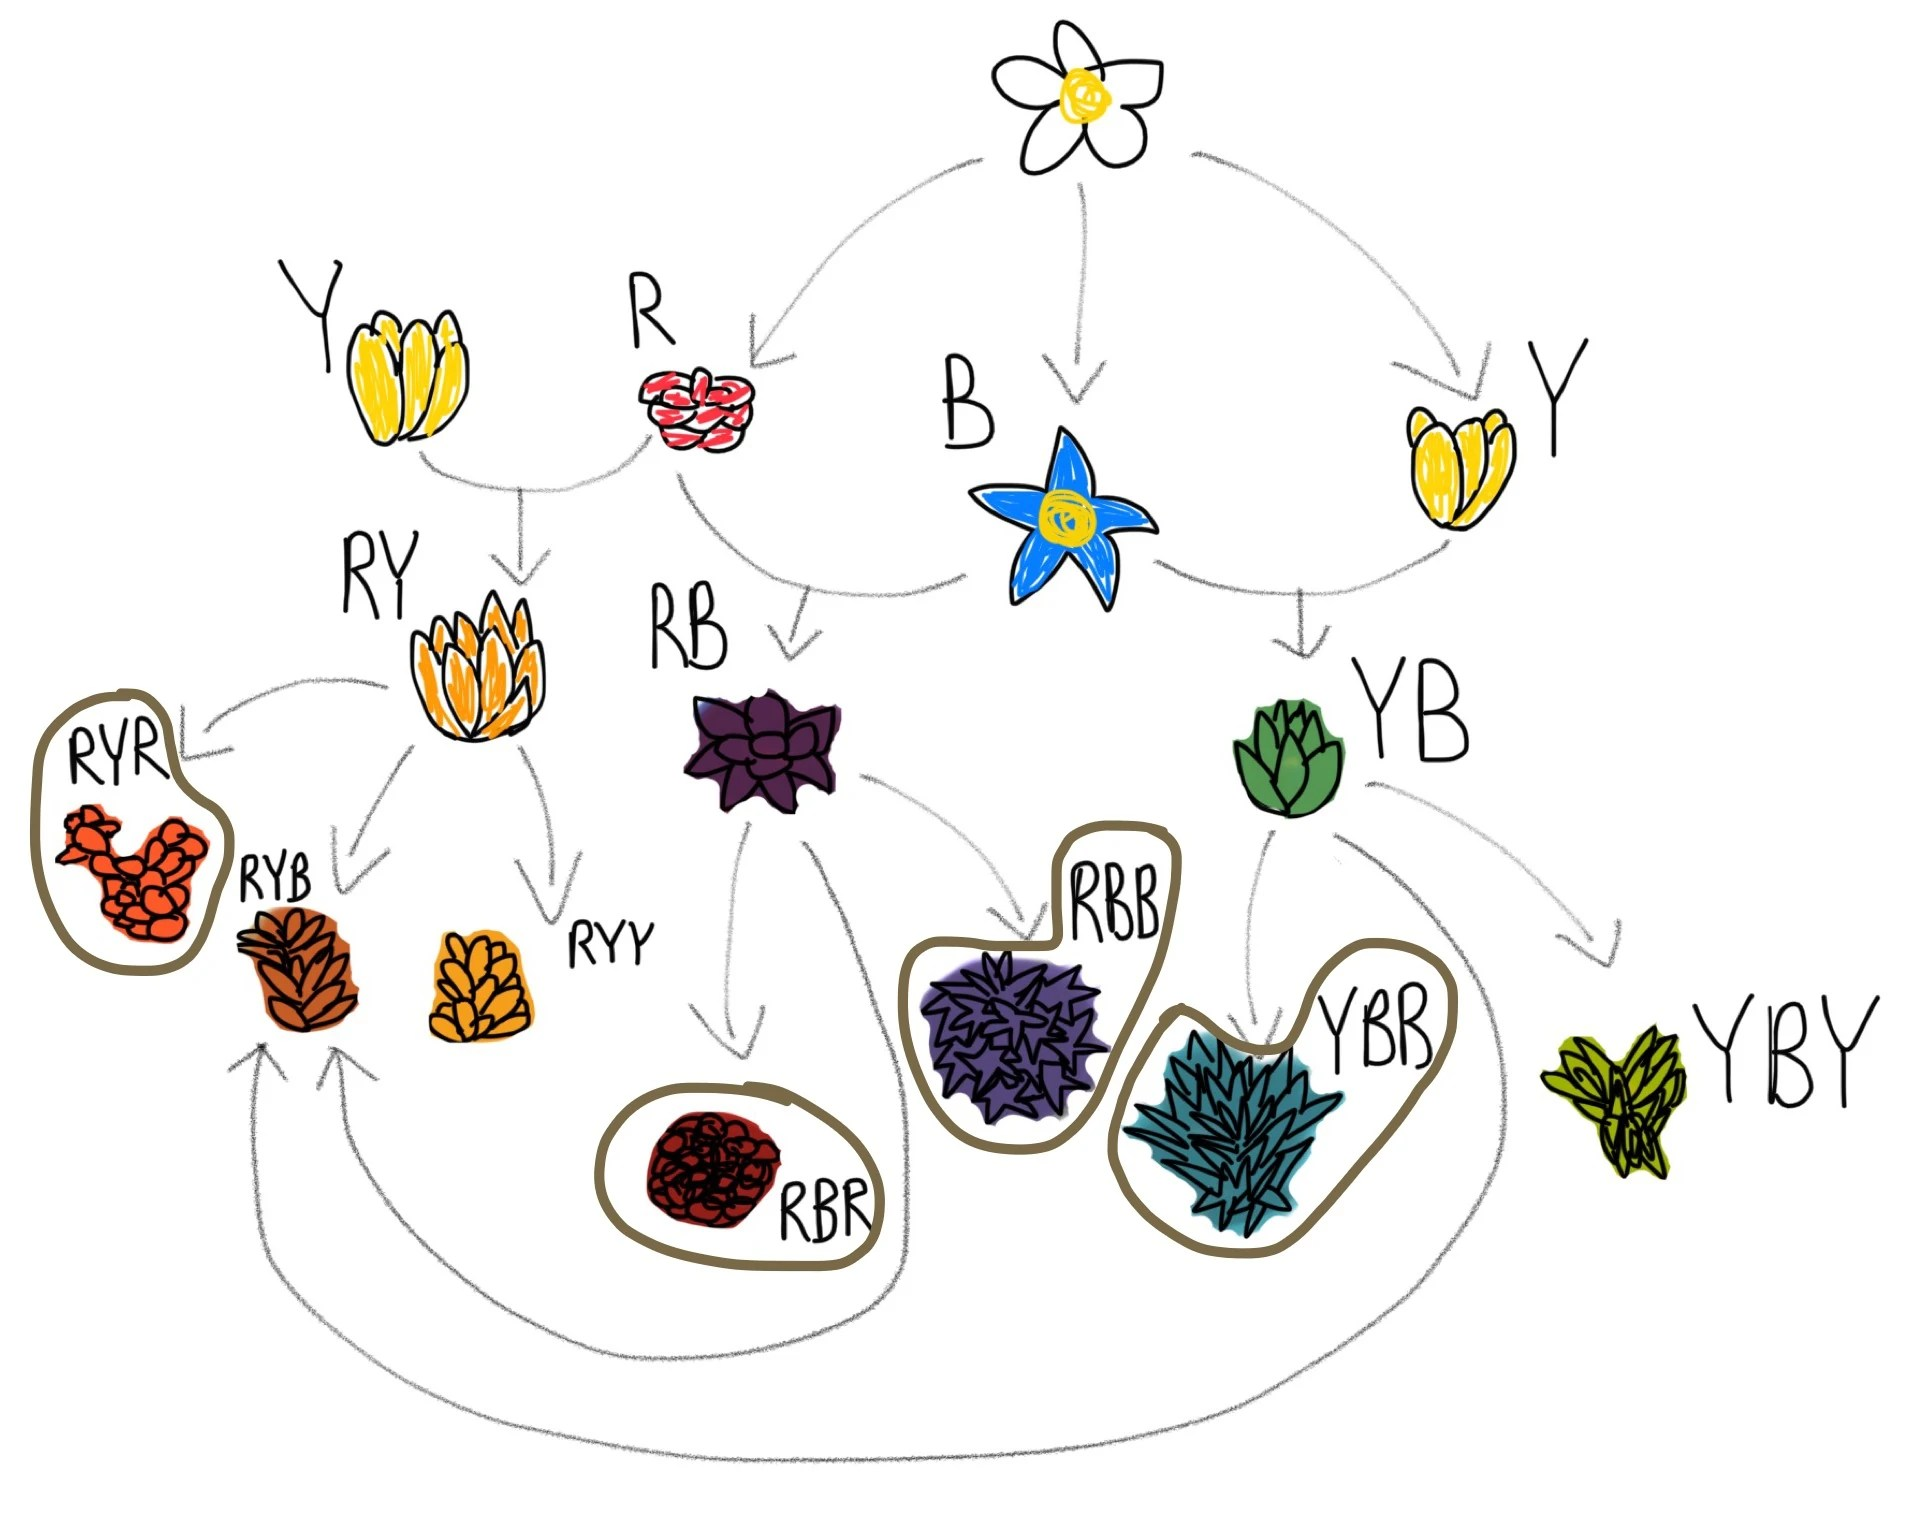 medium resolution of flowerdiagram